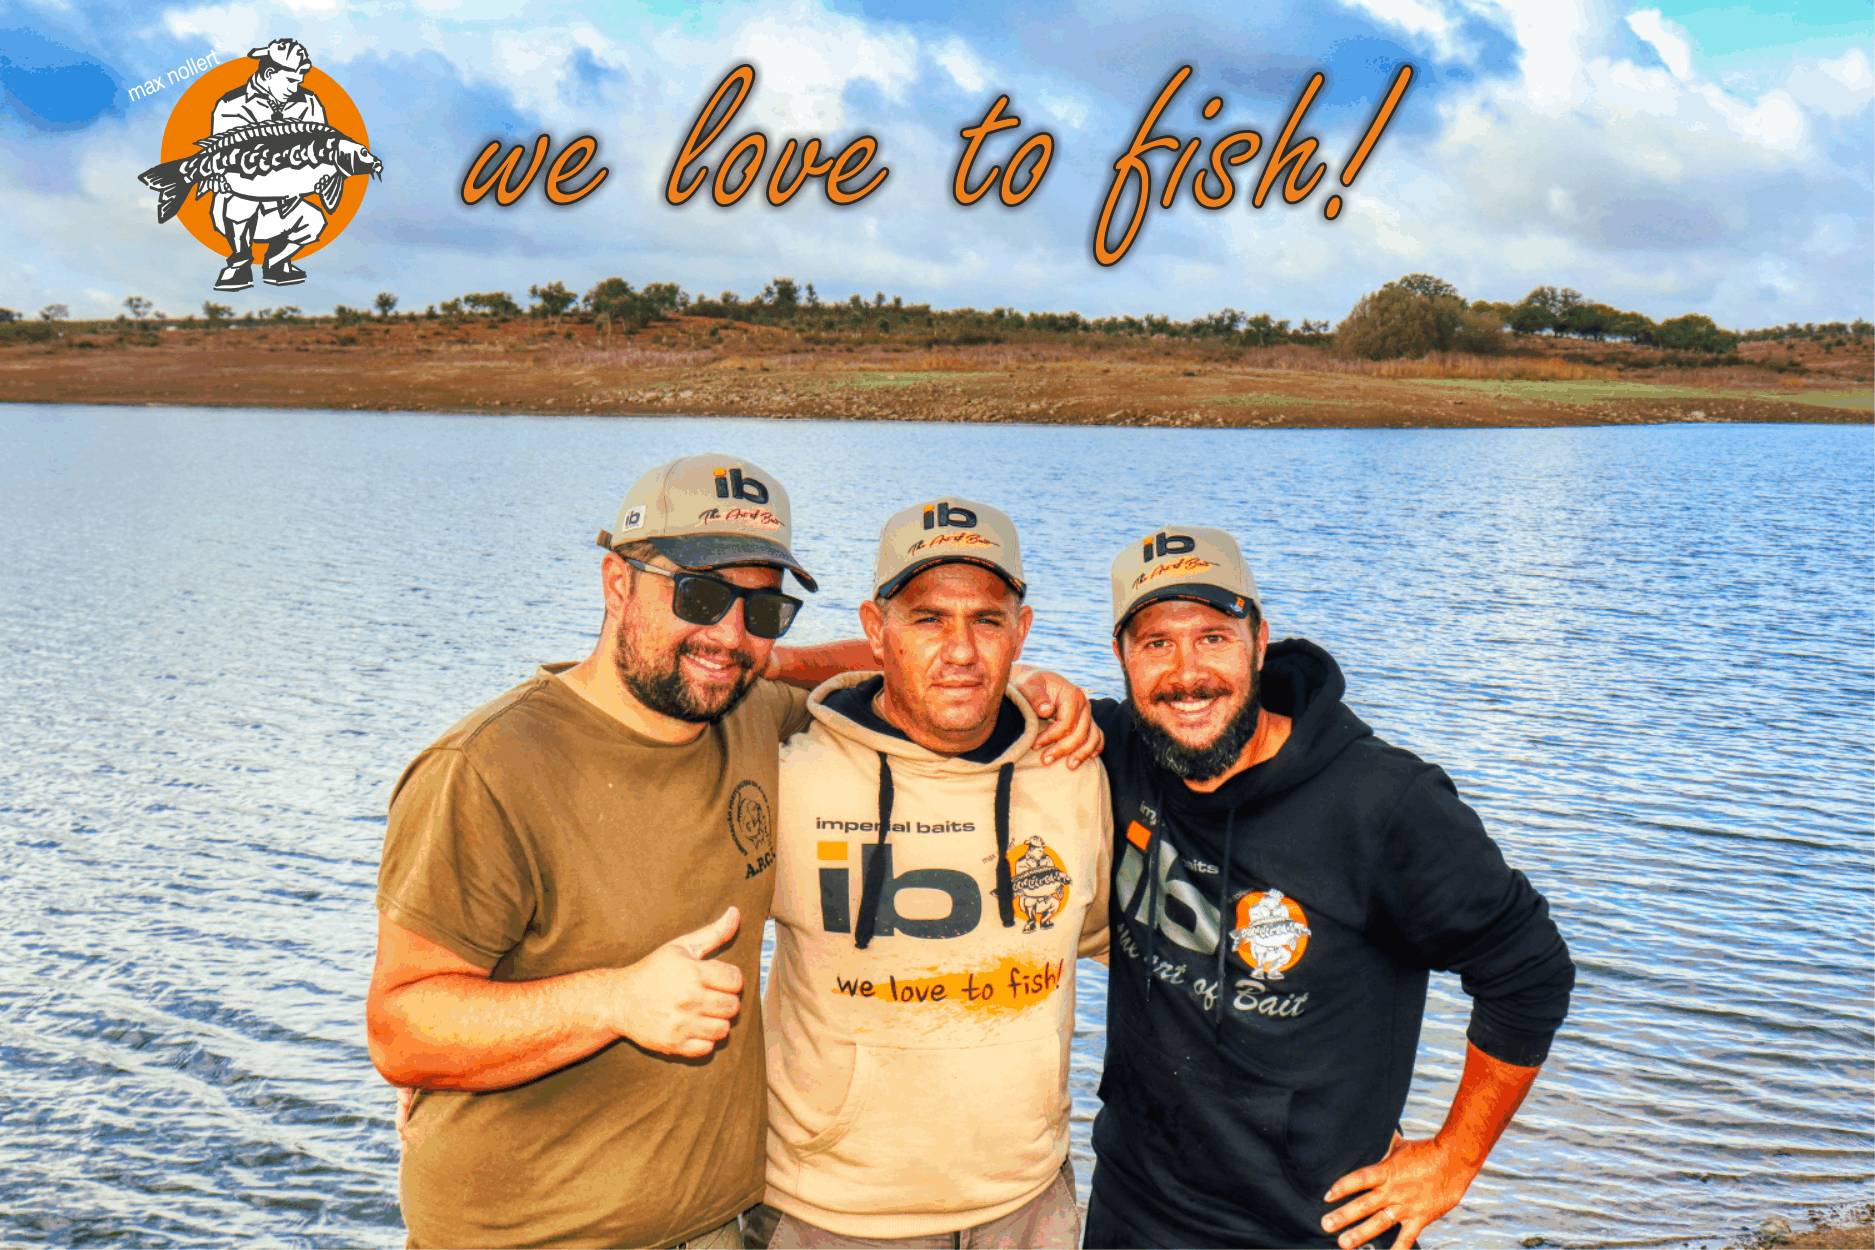 ib team we love to fish